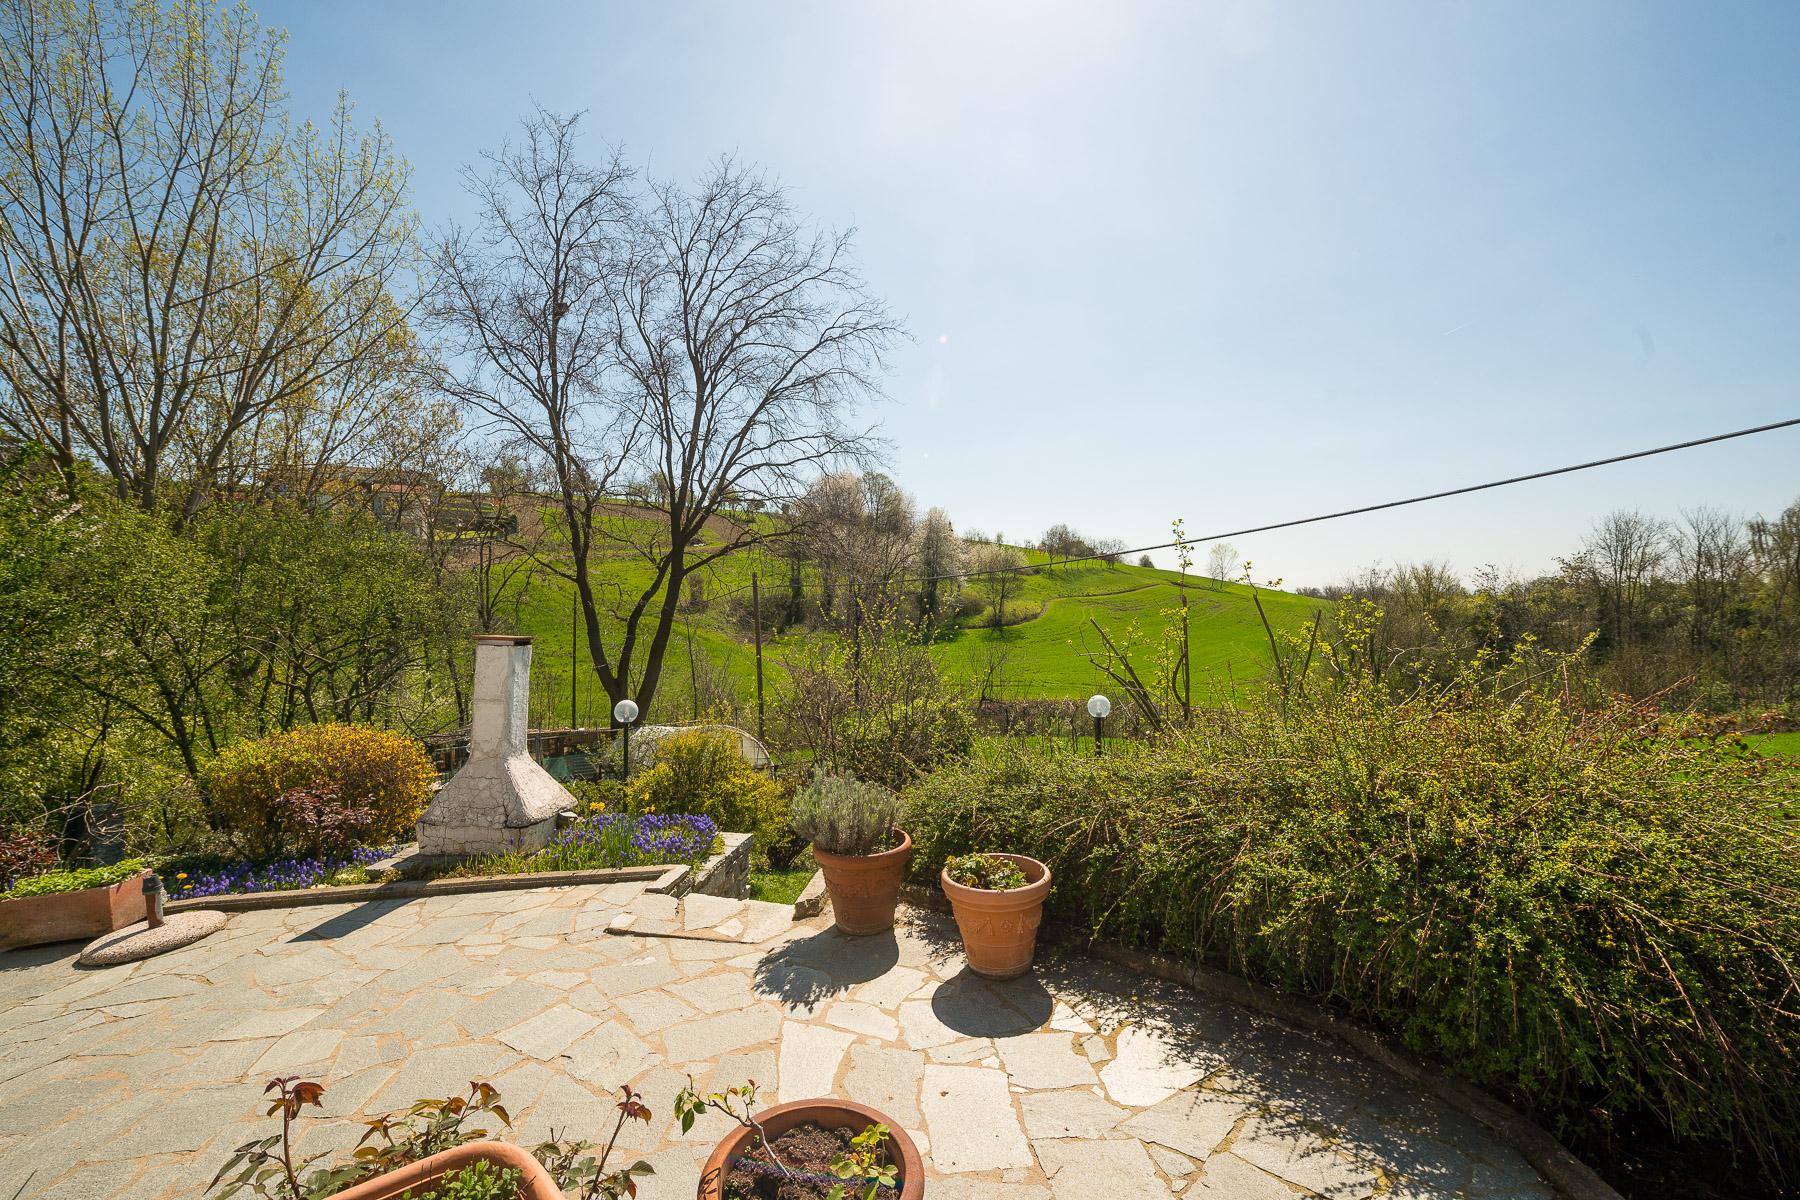 Villa in Vendita a Pino Torinese: 5 locali, 350 mq - Foto 20